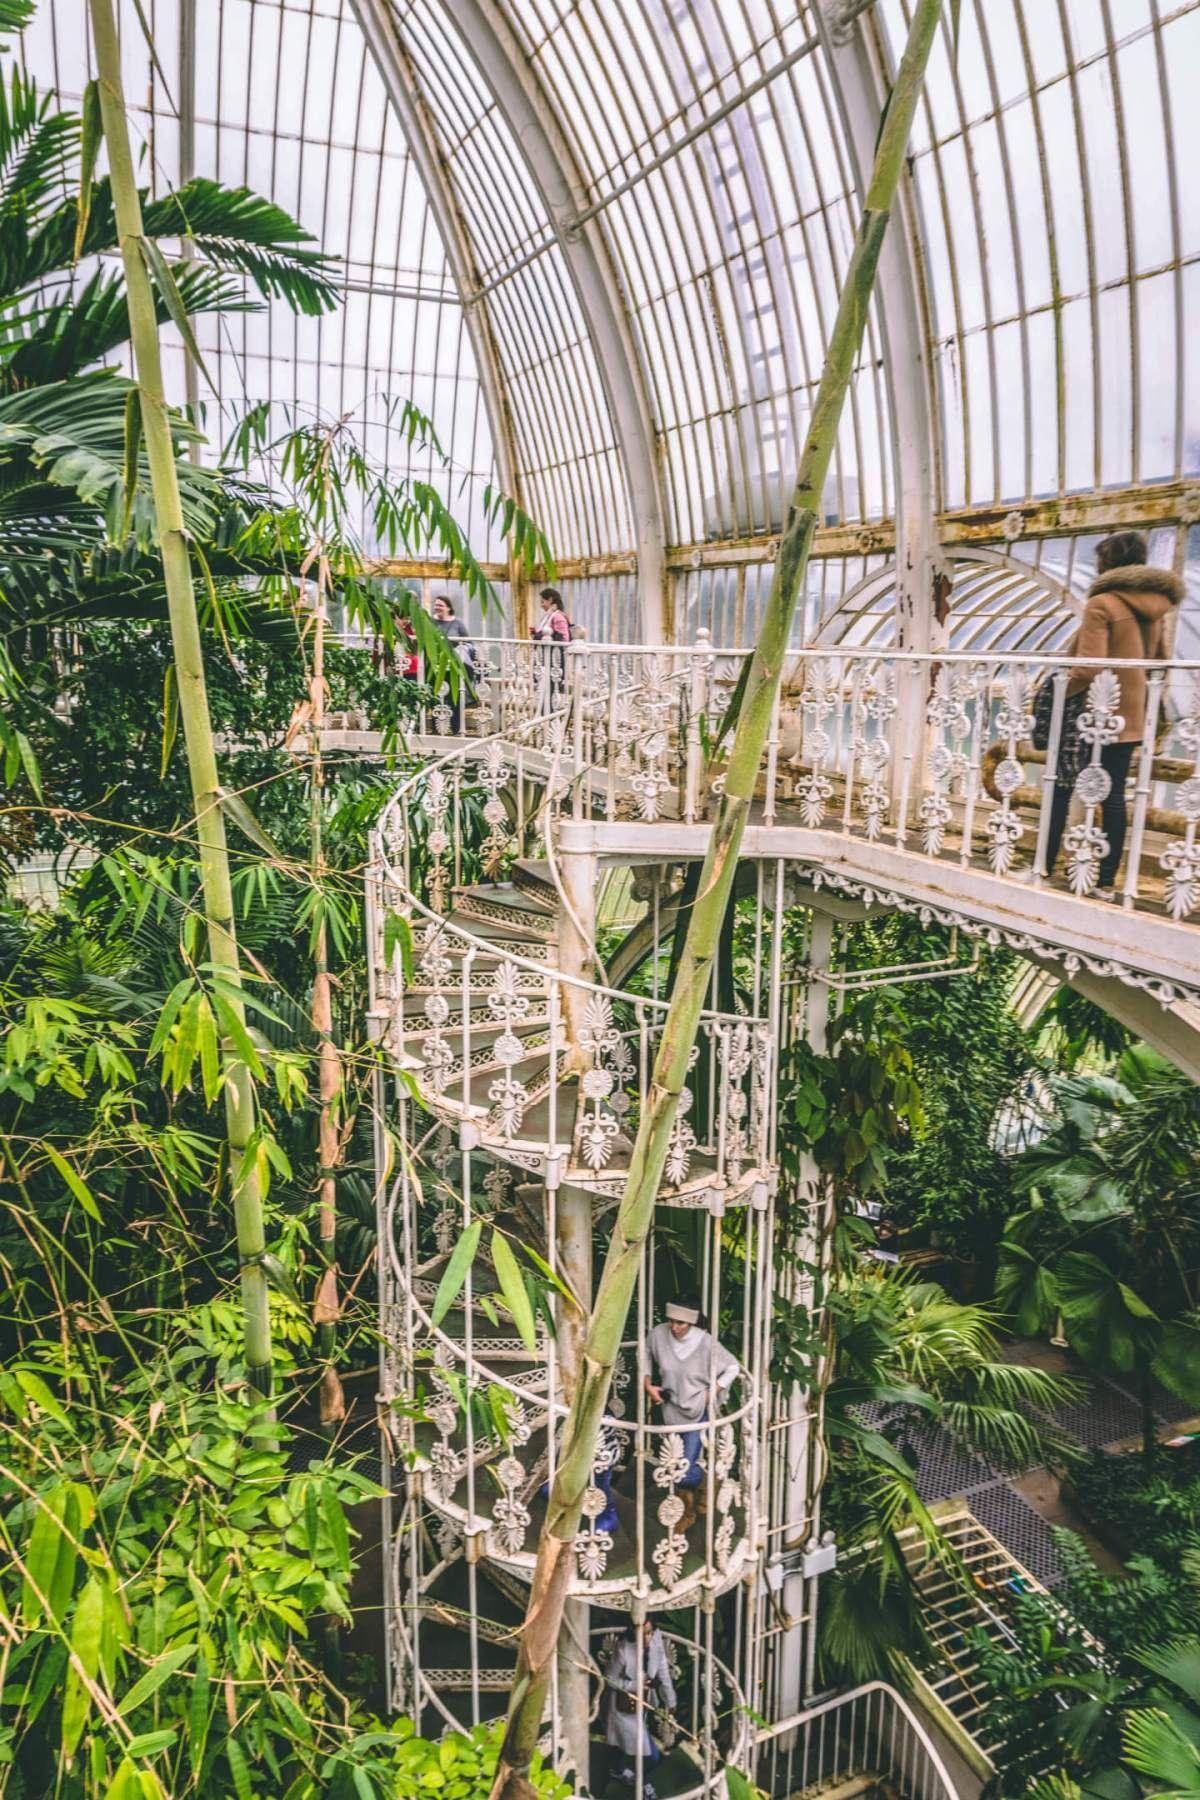 843627fdcb15164c94743266a7b2039b - Best Places To Stay Near Kew Gardens